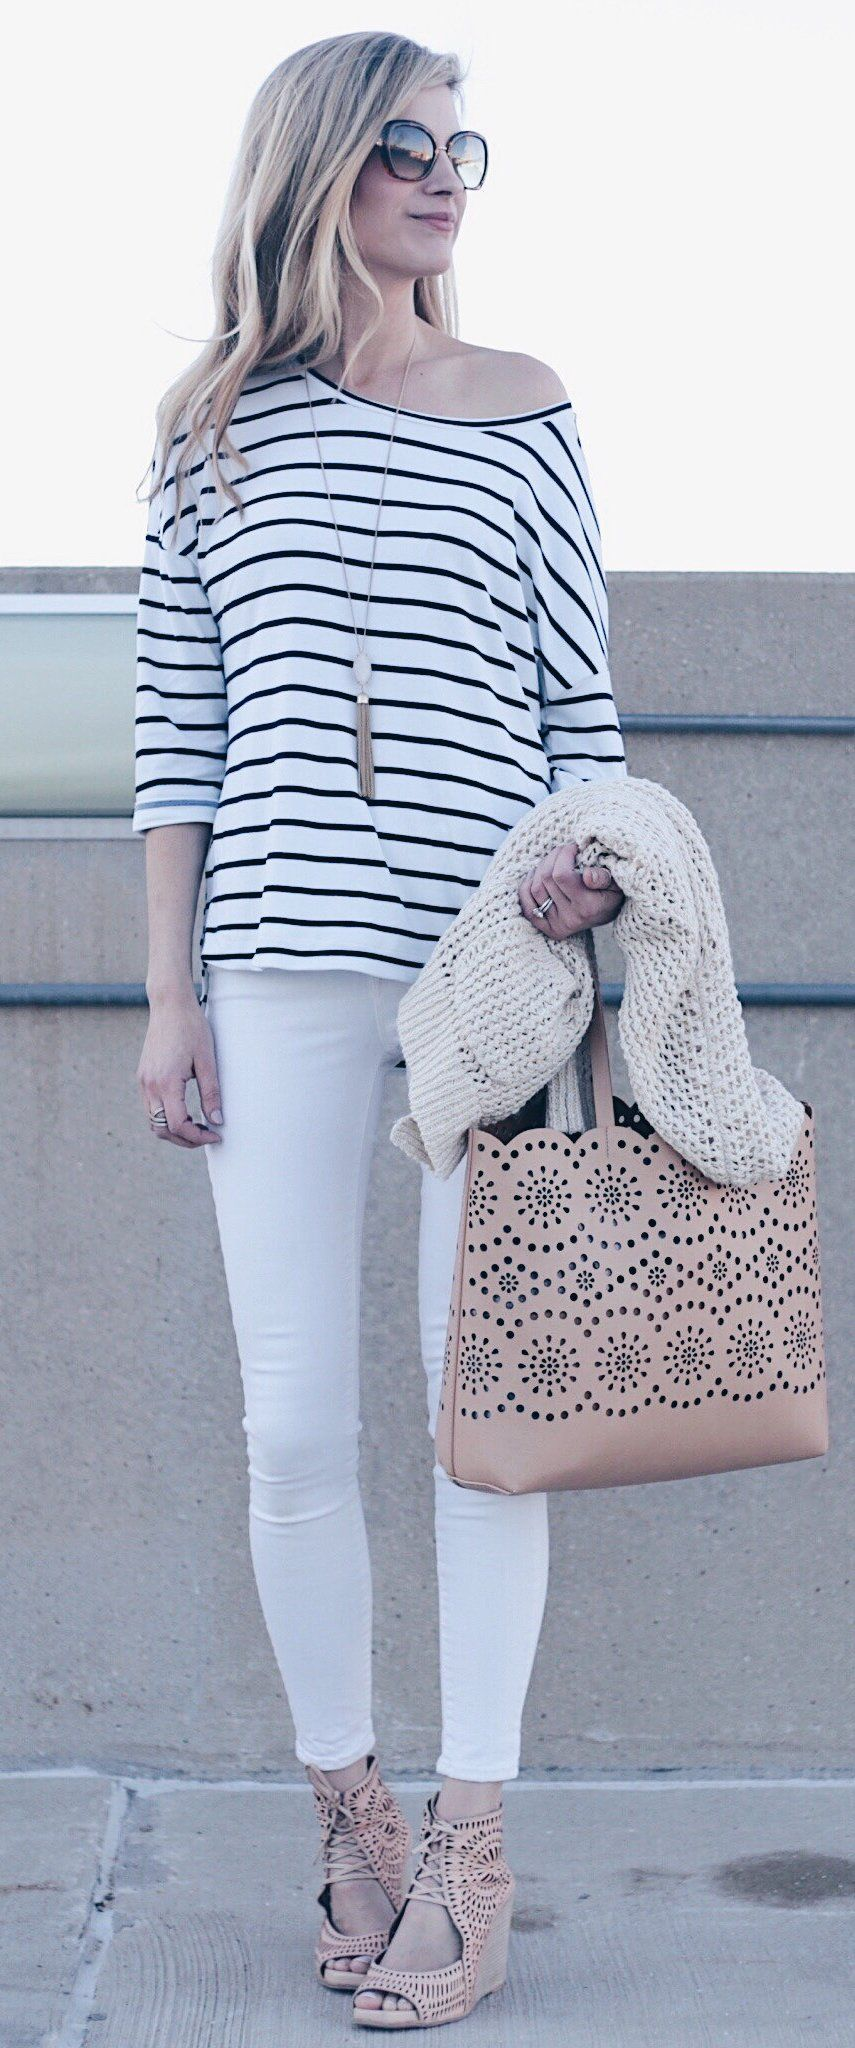 113272e574f76 White Striped Top   White Skinny Jeans   Beige Printed Tote Bag